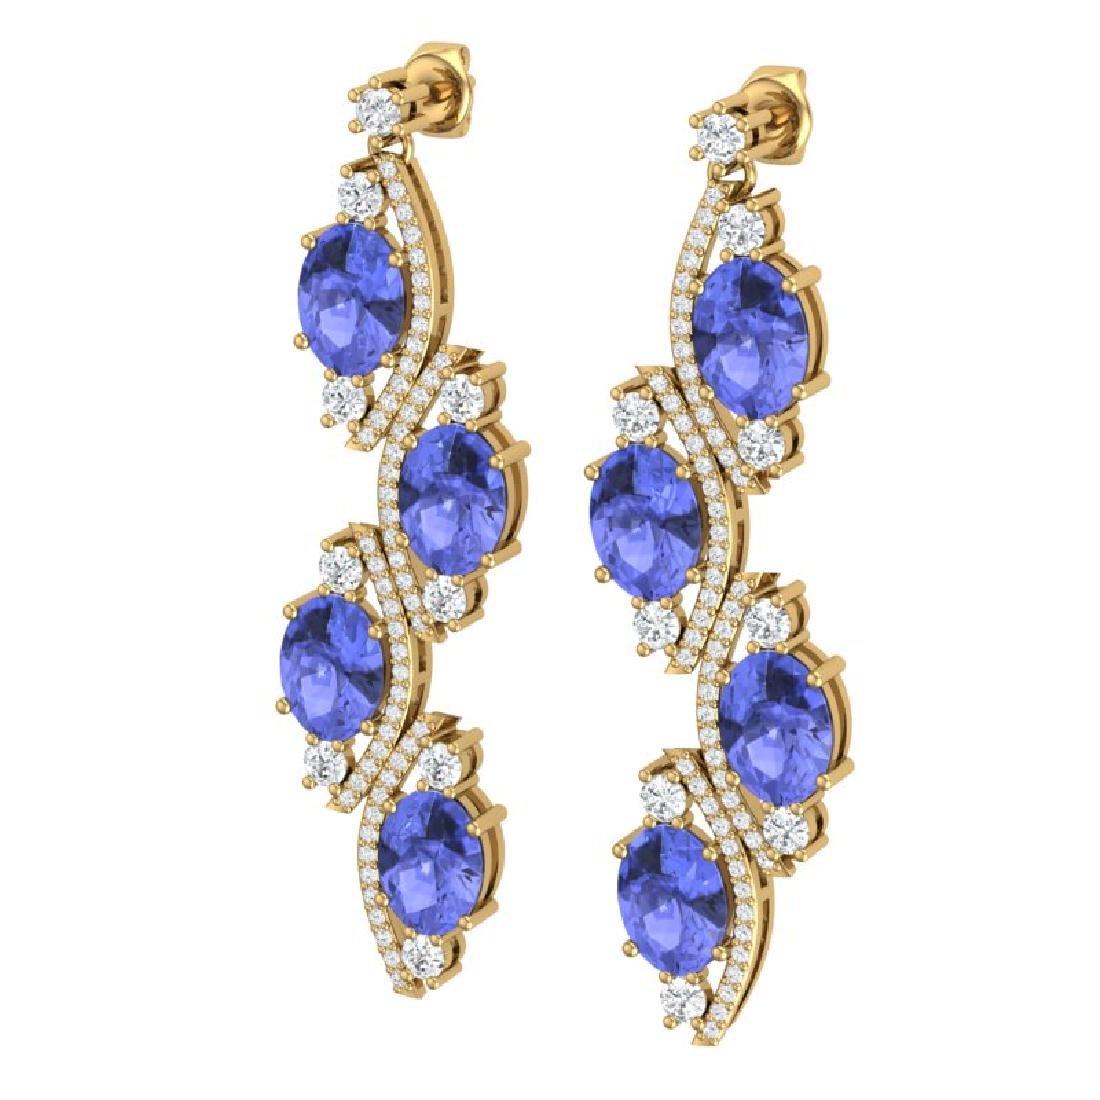 16.23 CTW Royalty Tanzanite & VS Diamond Earrings 18K - 2